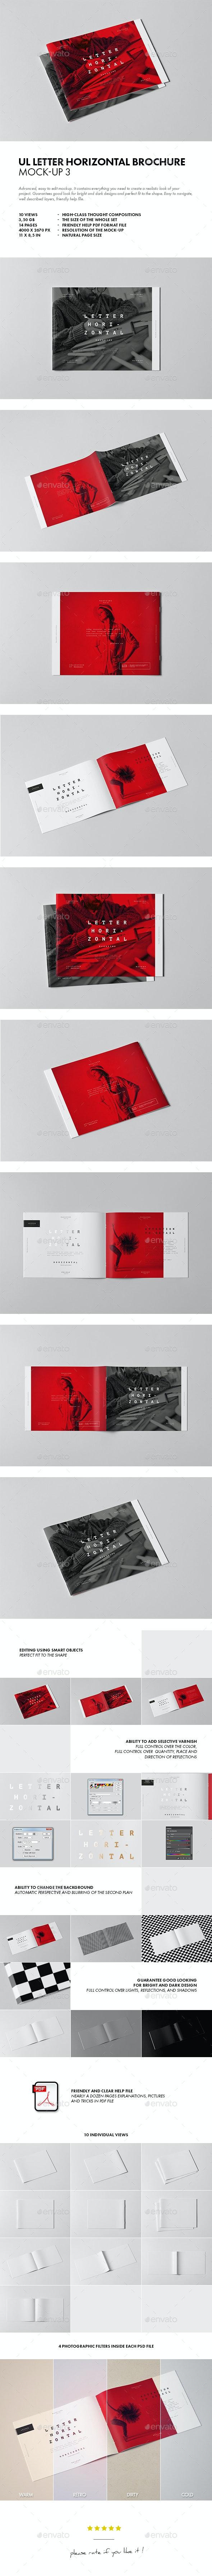 US Letter Horizontal Brochure Mock-up 3 - Brochures Print